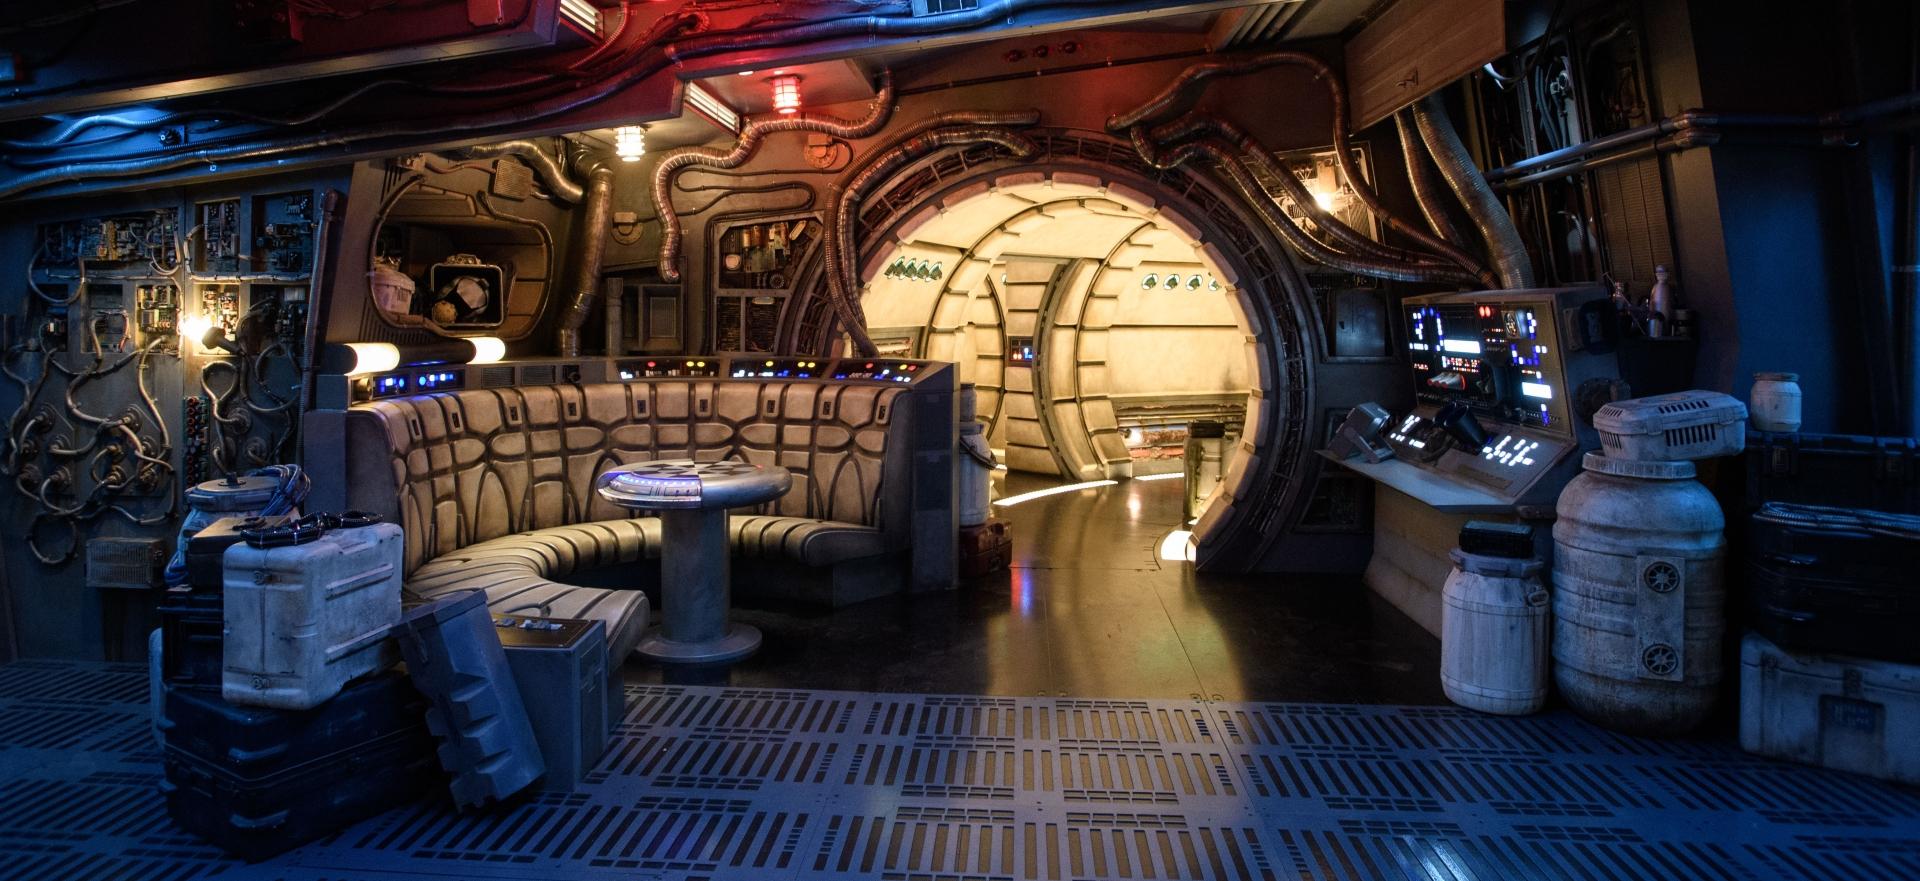 Disney inaugura il parco a tema Star Wars